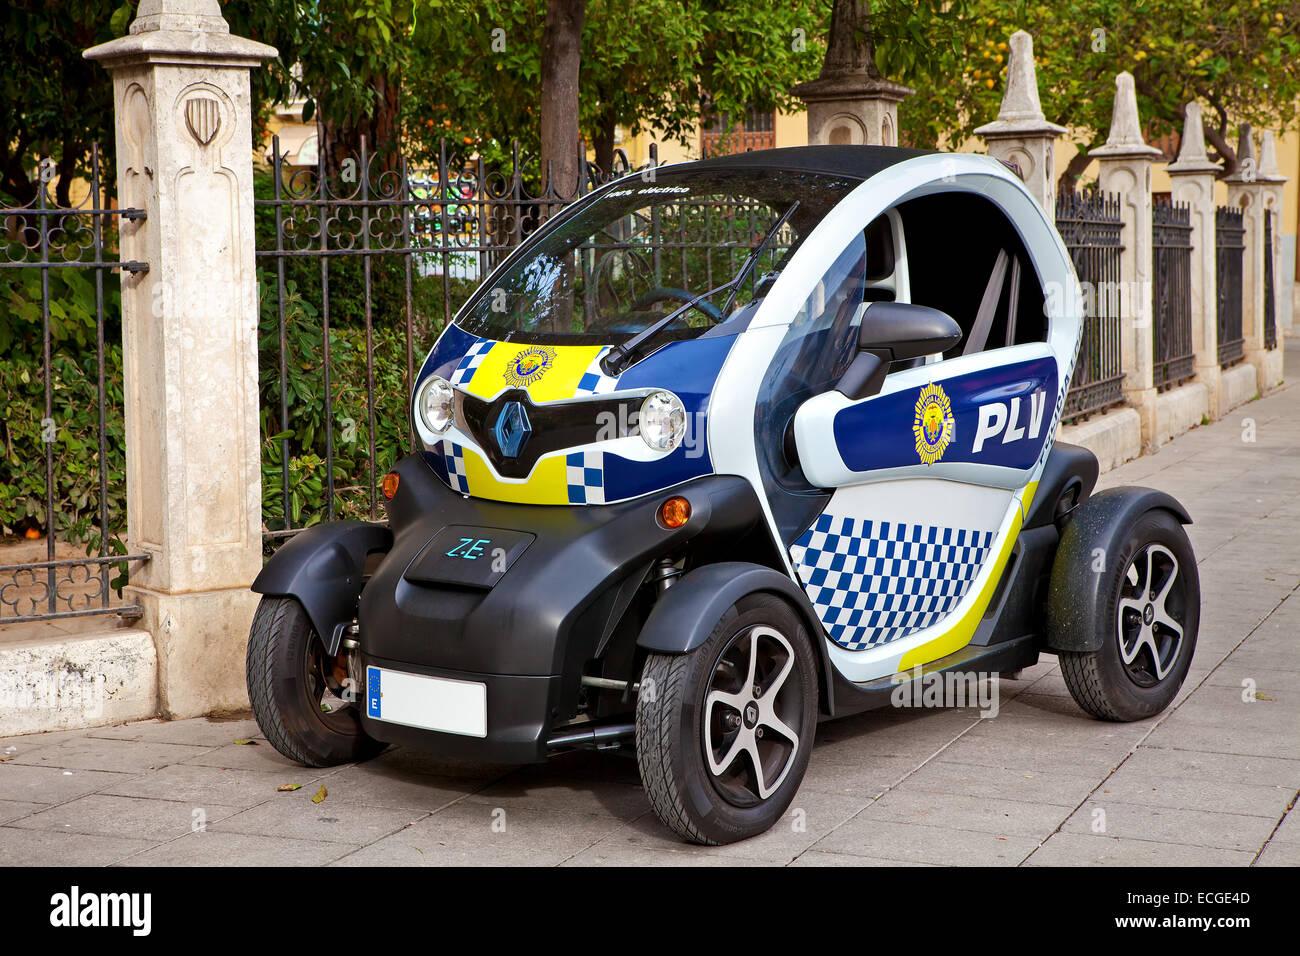 Police car on the street of Valencia, Spain. Stock Photo